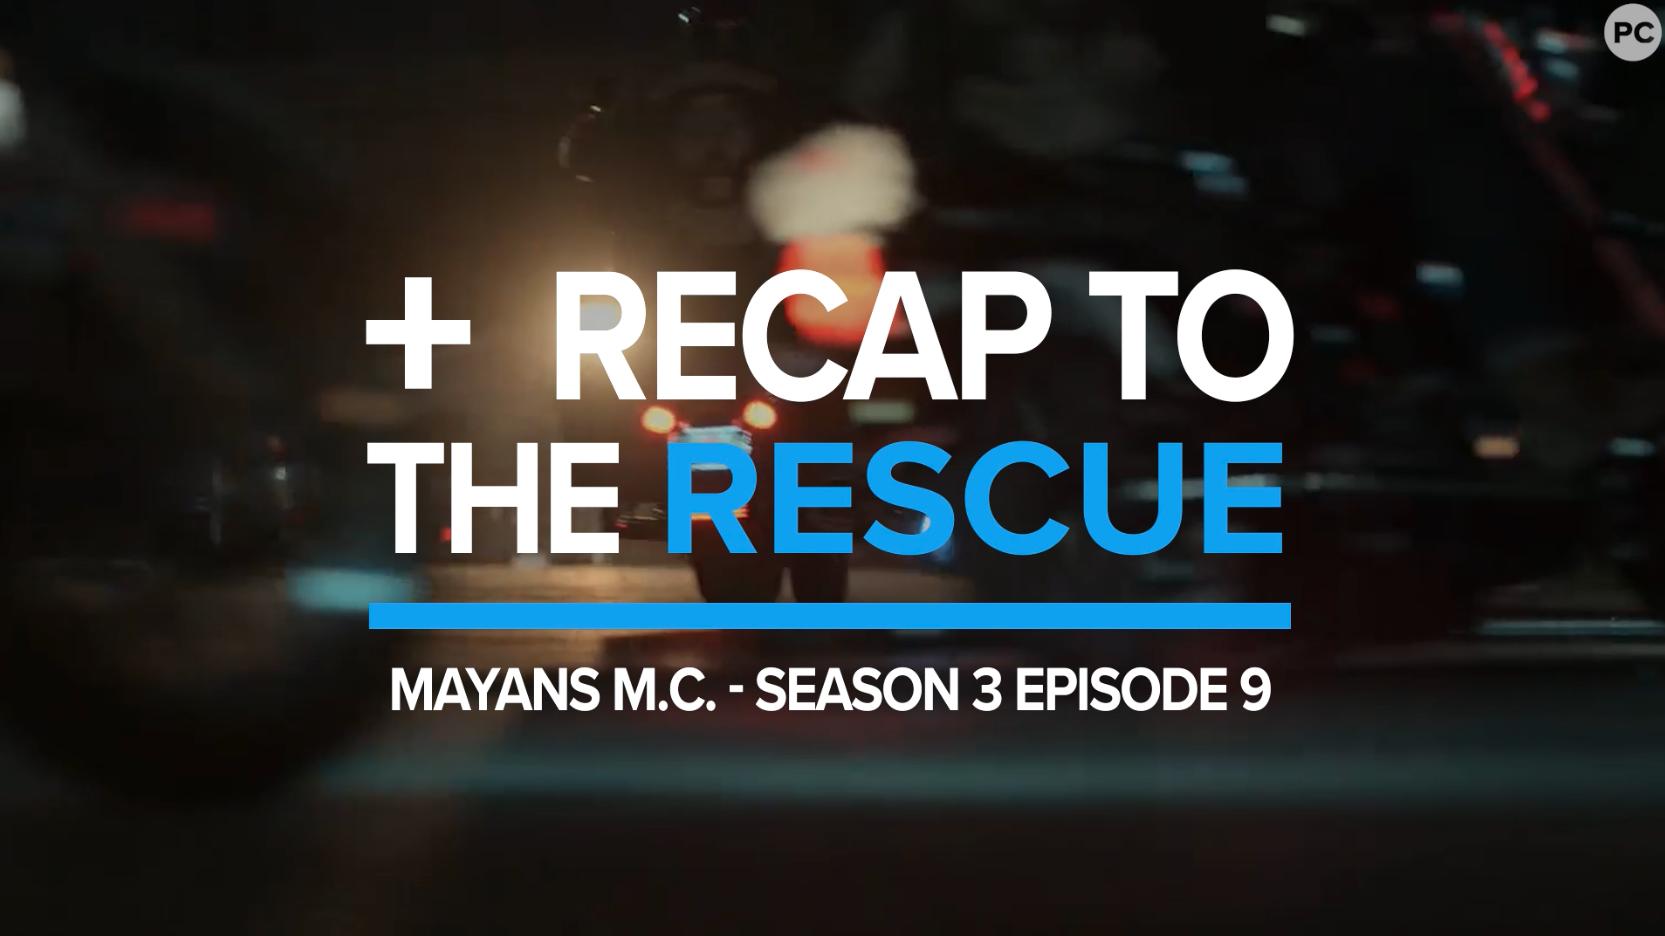 Mayans M.C. Season 3 Episode 9 - Recap To The Rescue